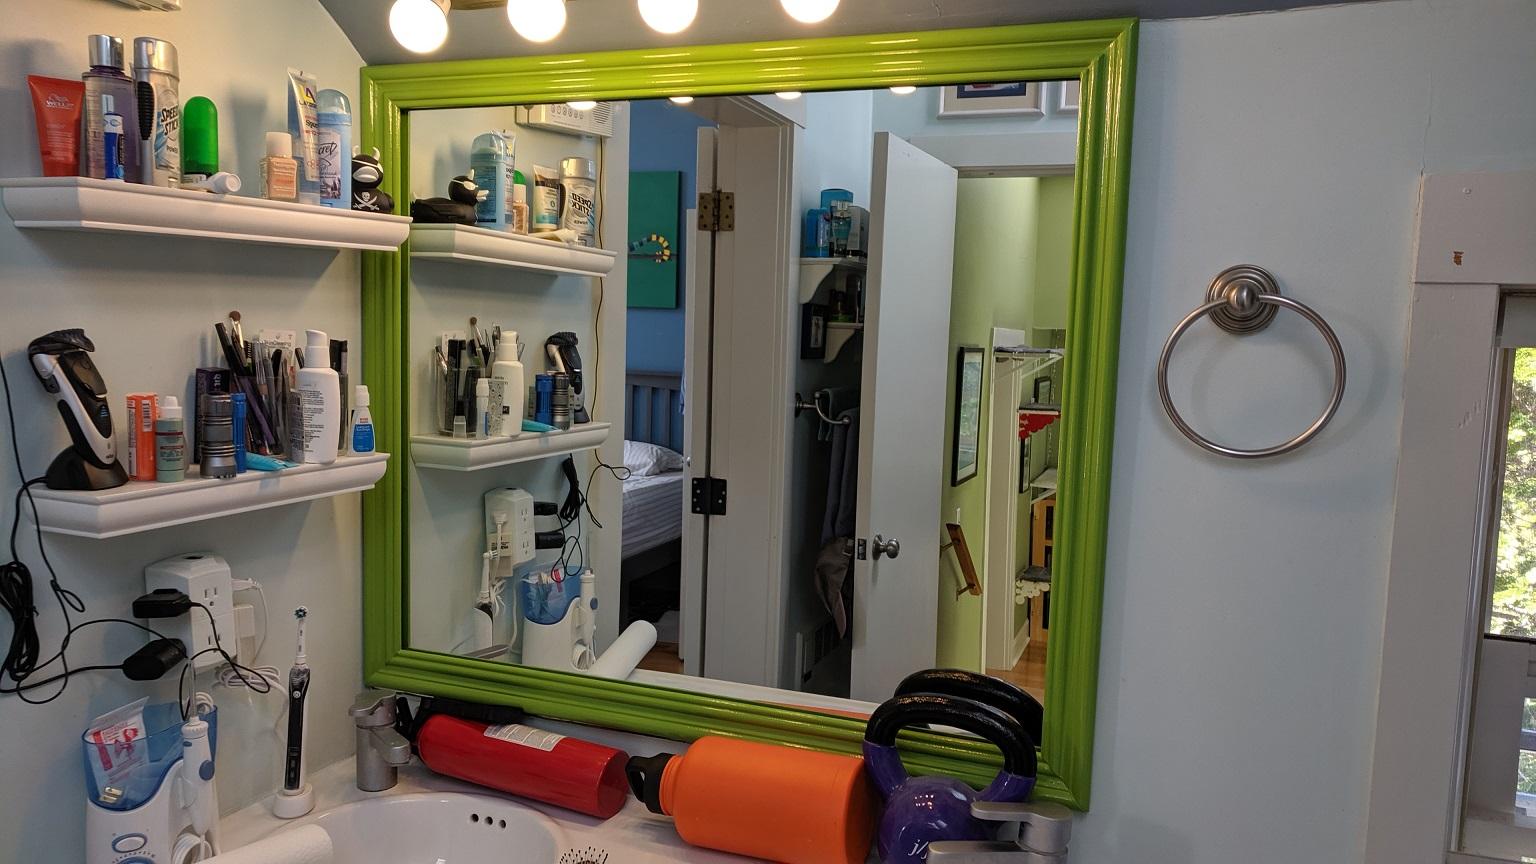 Bathroom Mirror Frame – Part 1